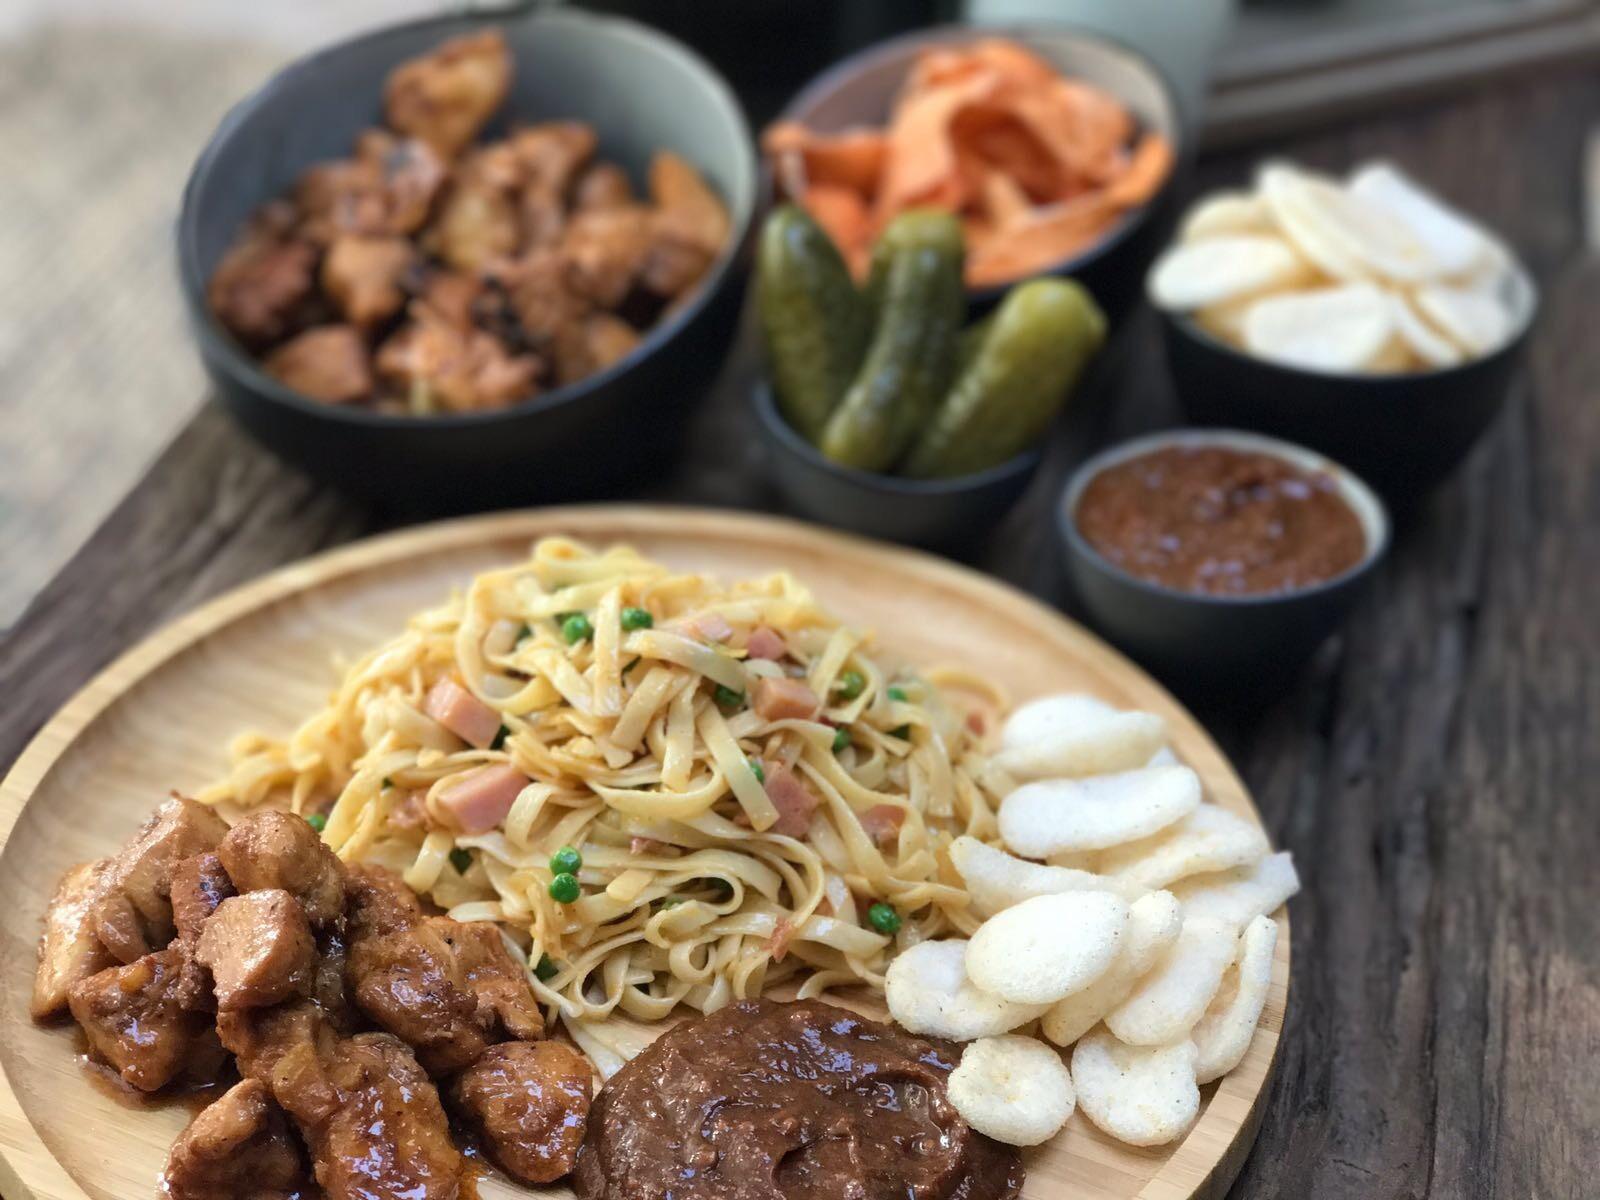 Chinese bami met pittige satésaus - Familie over de kook